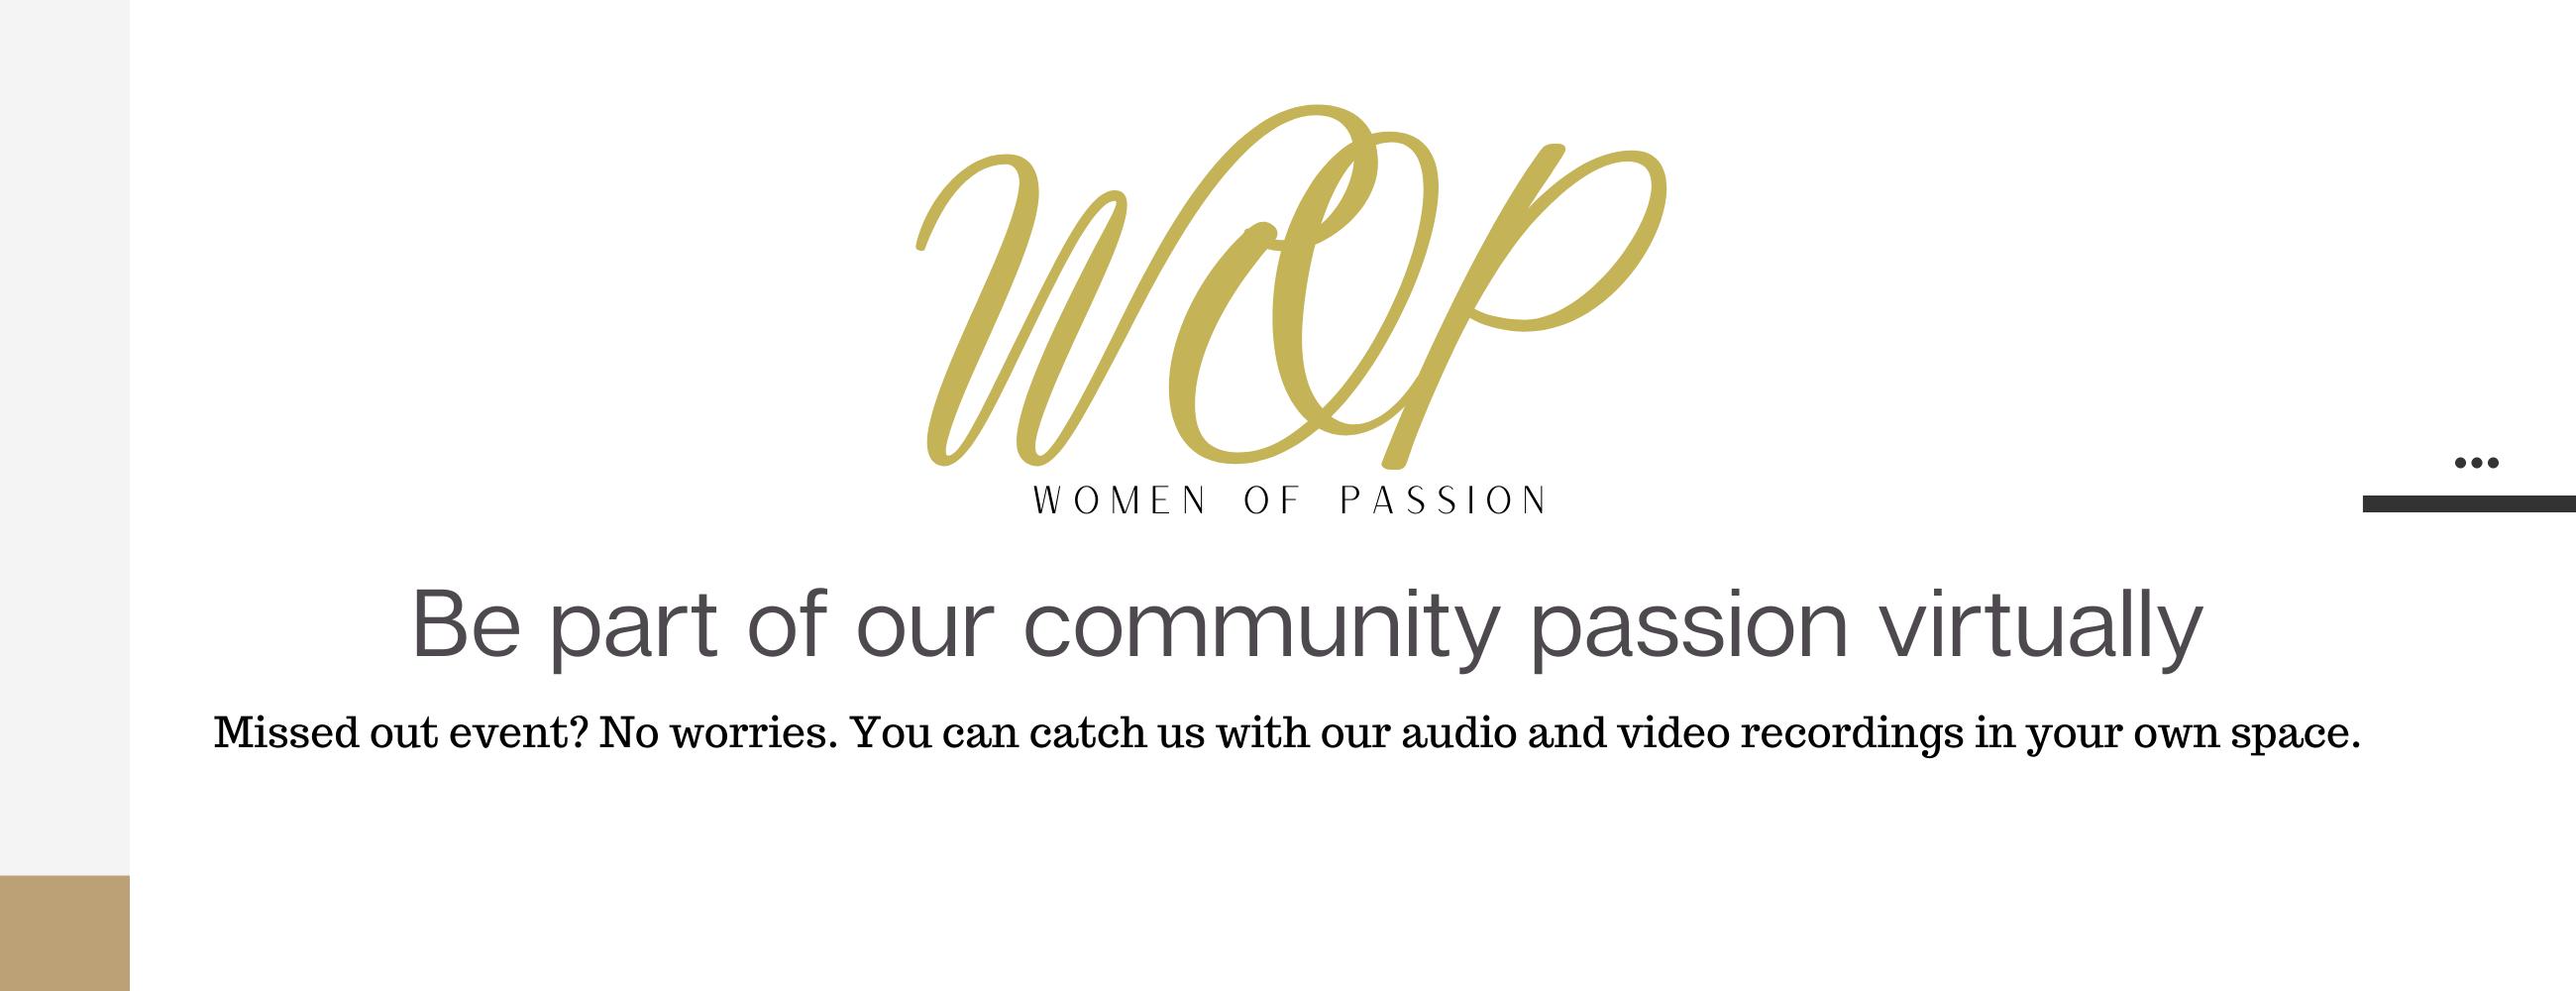 Women of Passion